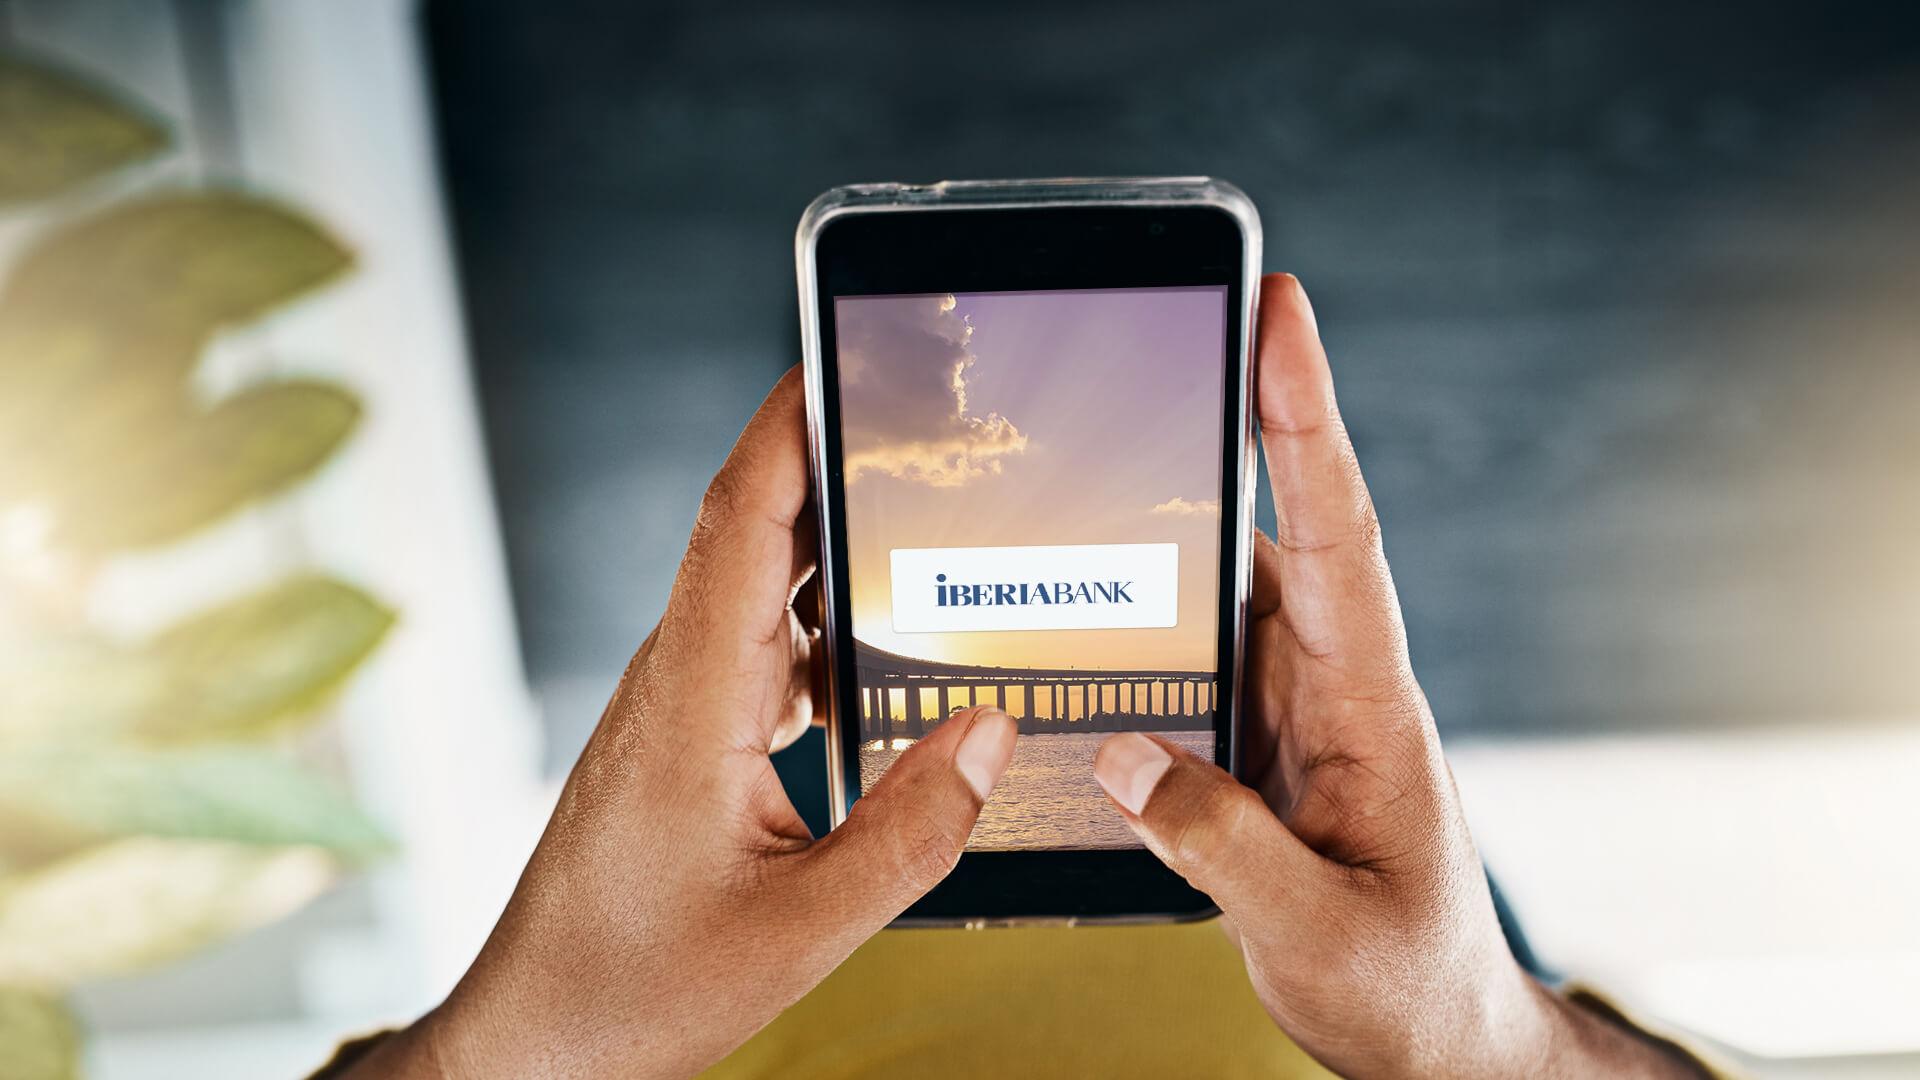 Iberiabank mobile banking app